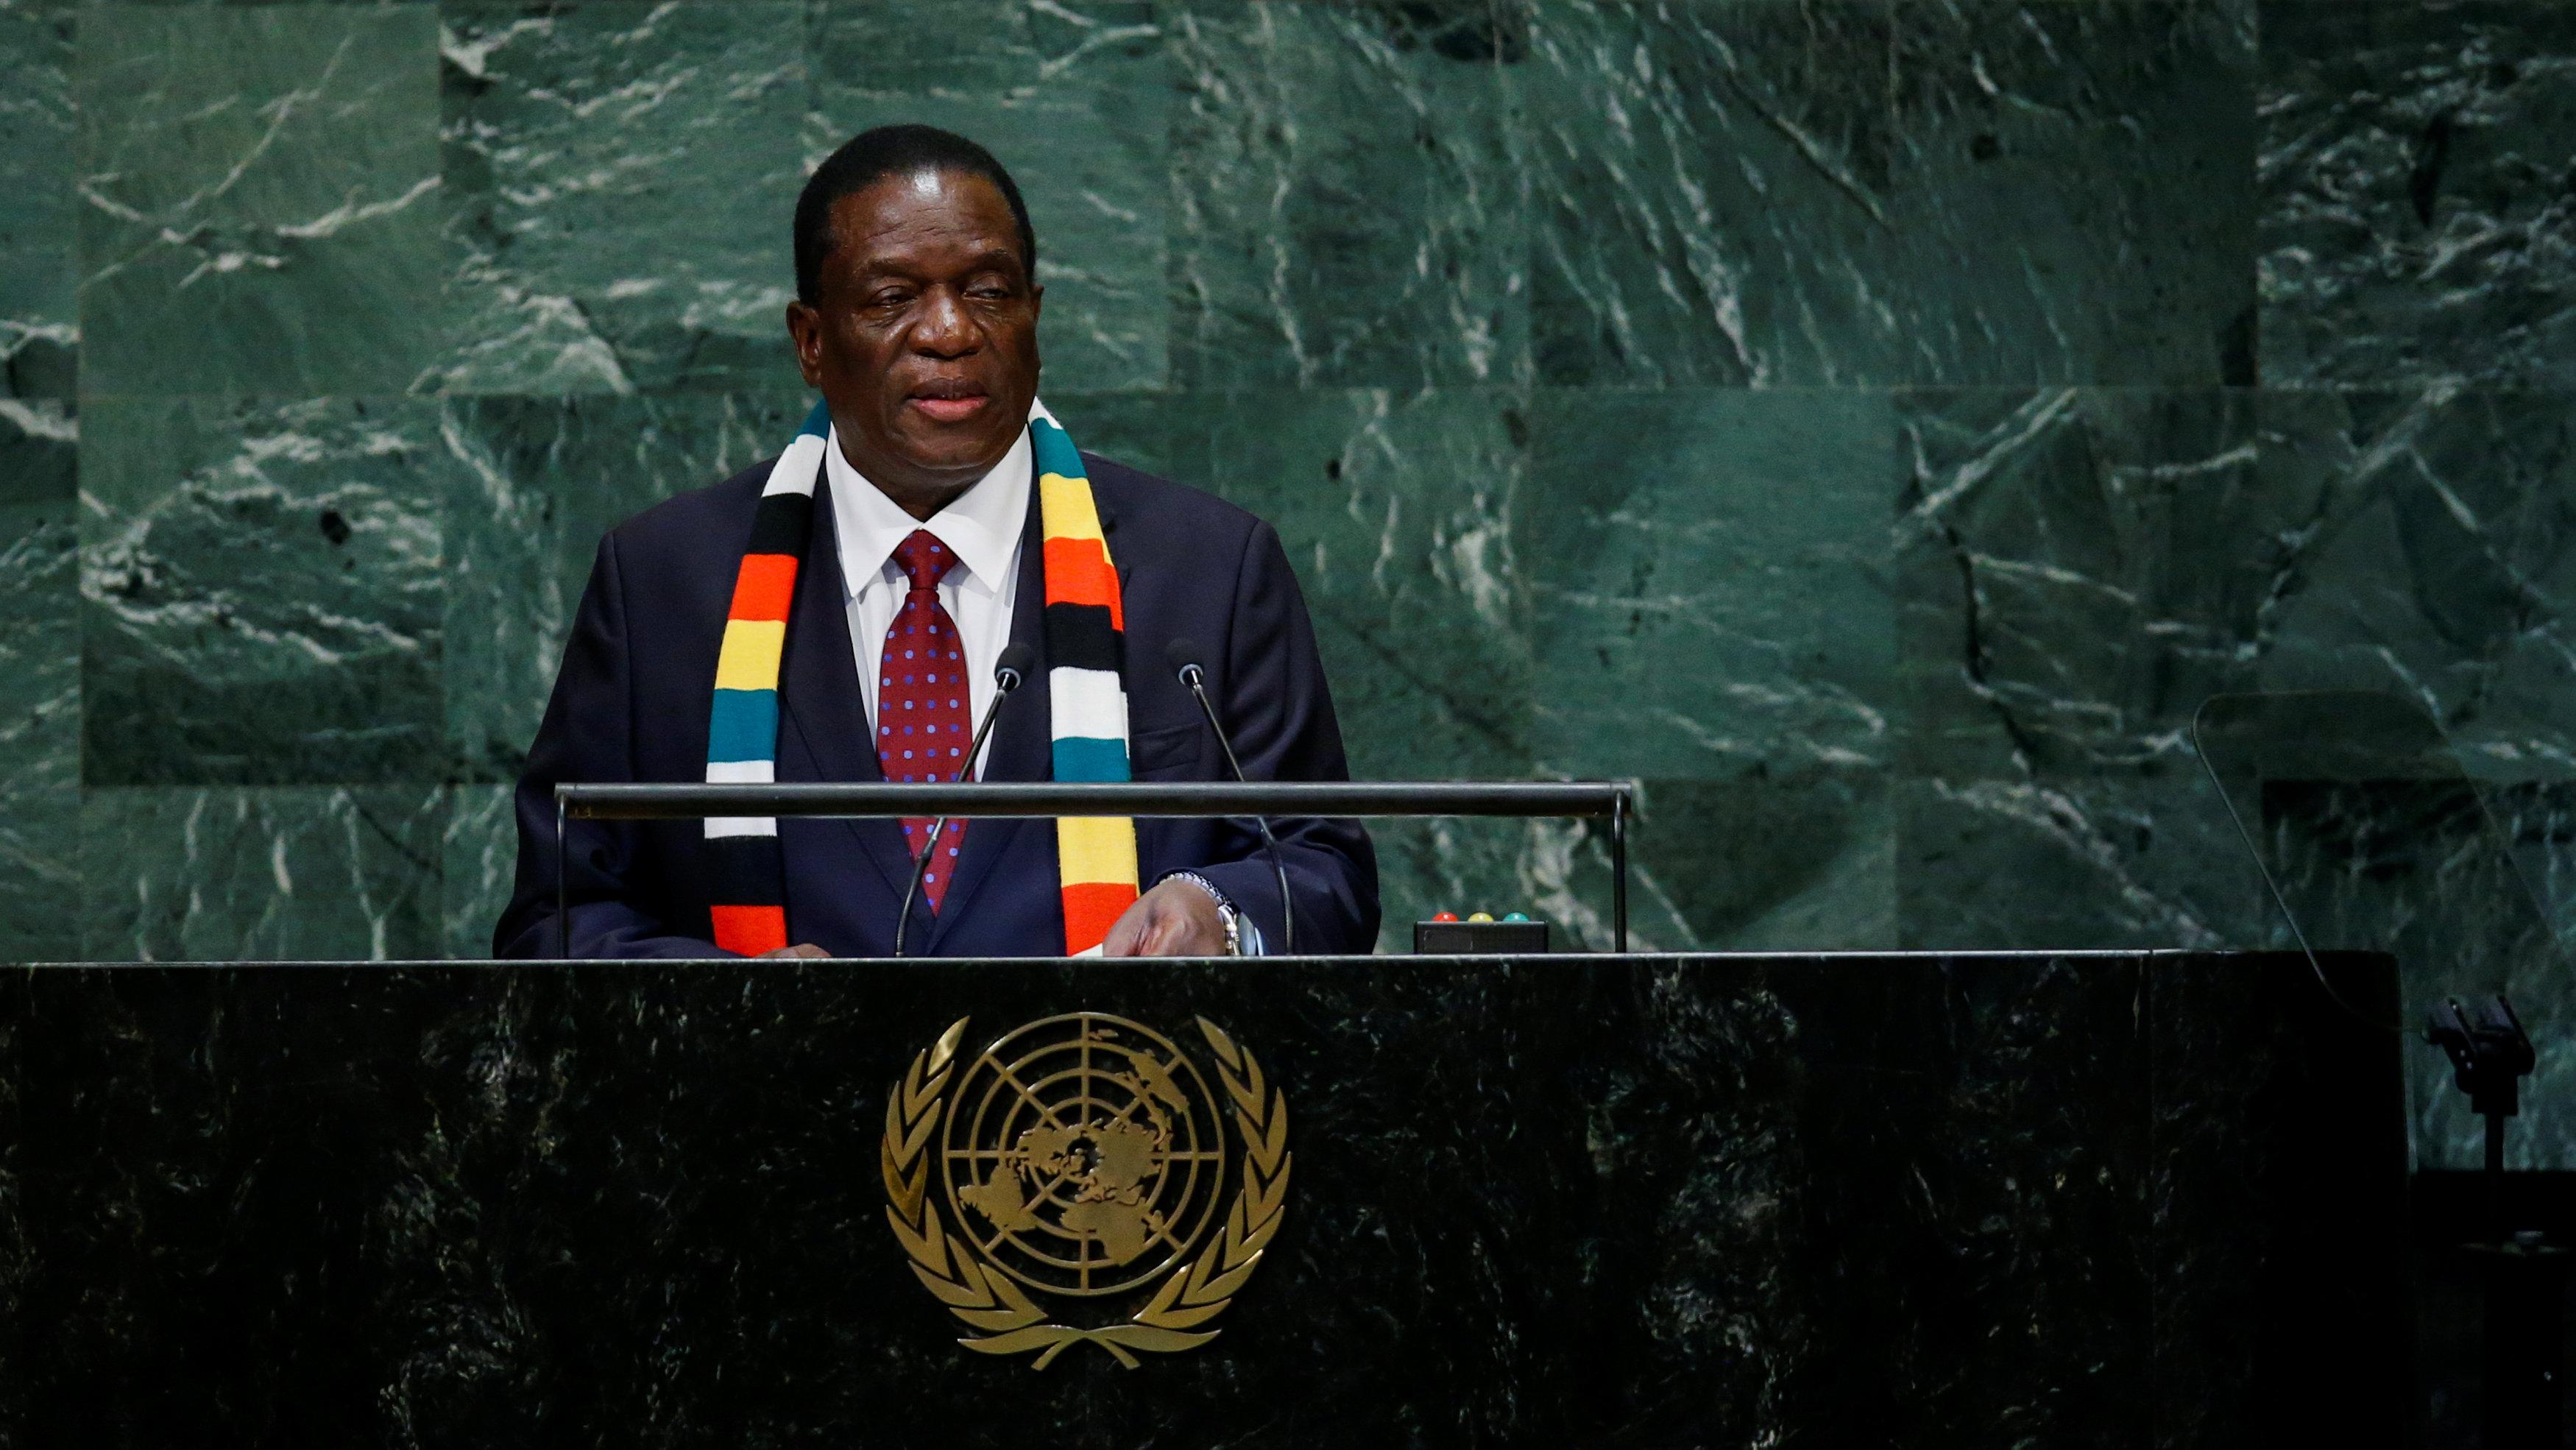 US press Zim over media freedom amid calls to lift sanctions